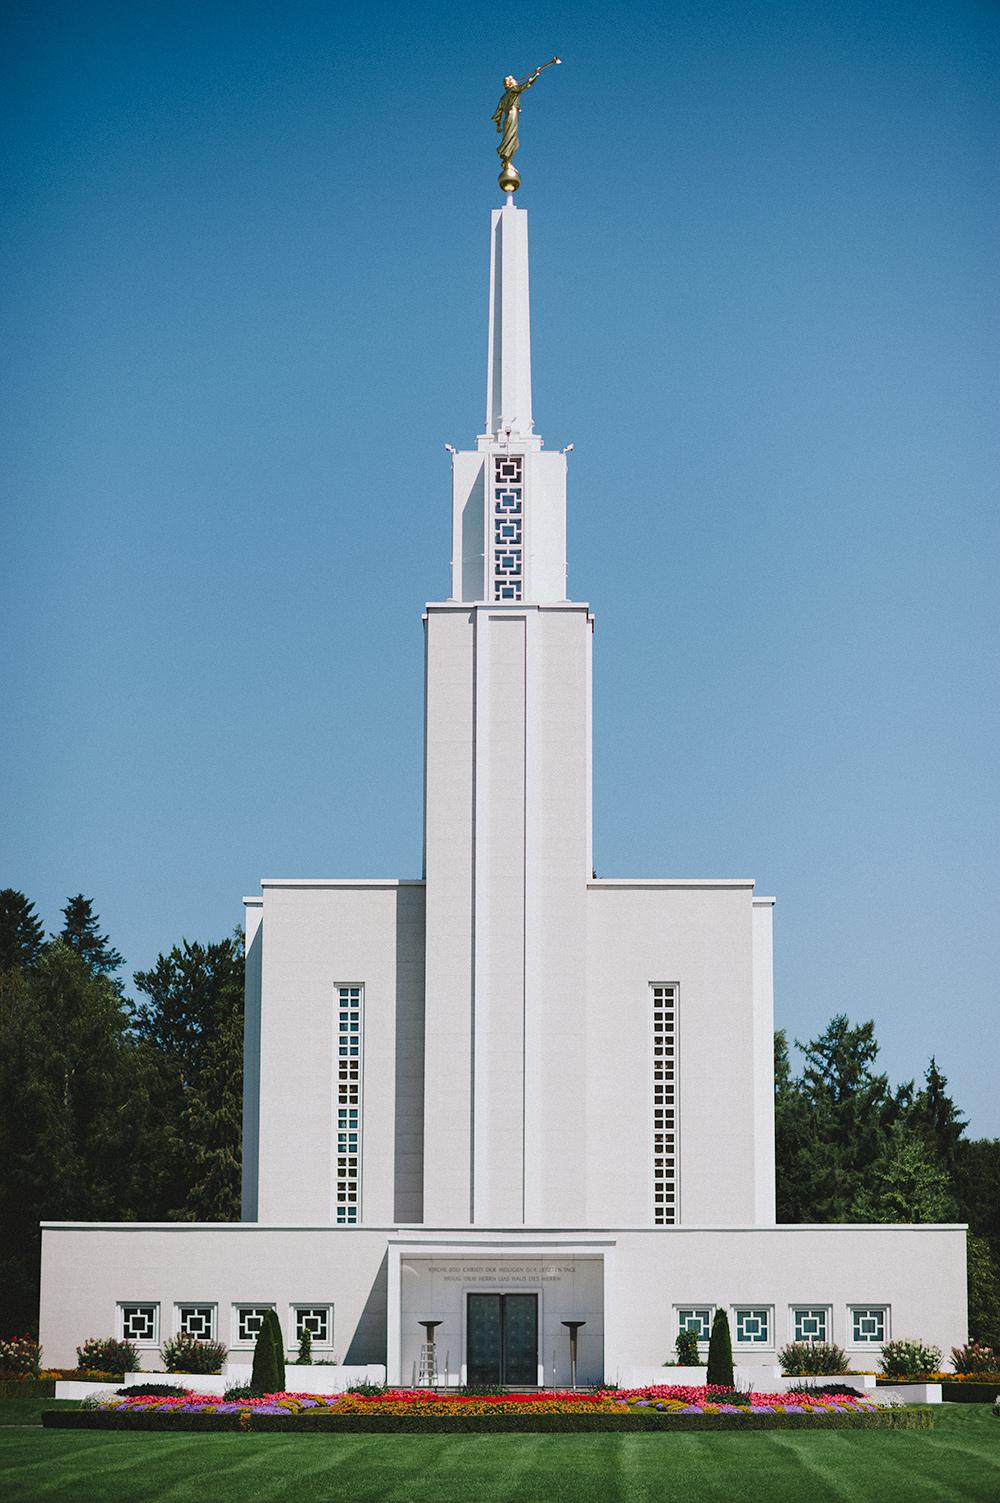 Bern Switzerland Temple, dedicated in 1955 by President McKay; rededicated in 1992 by President Hinckley